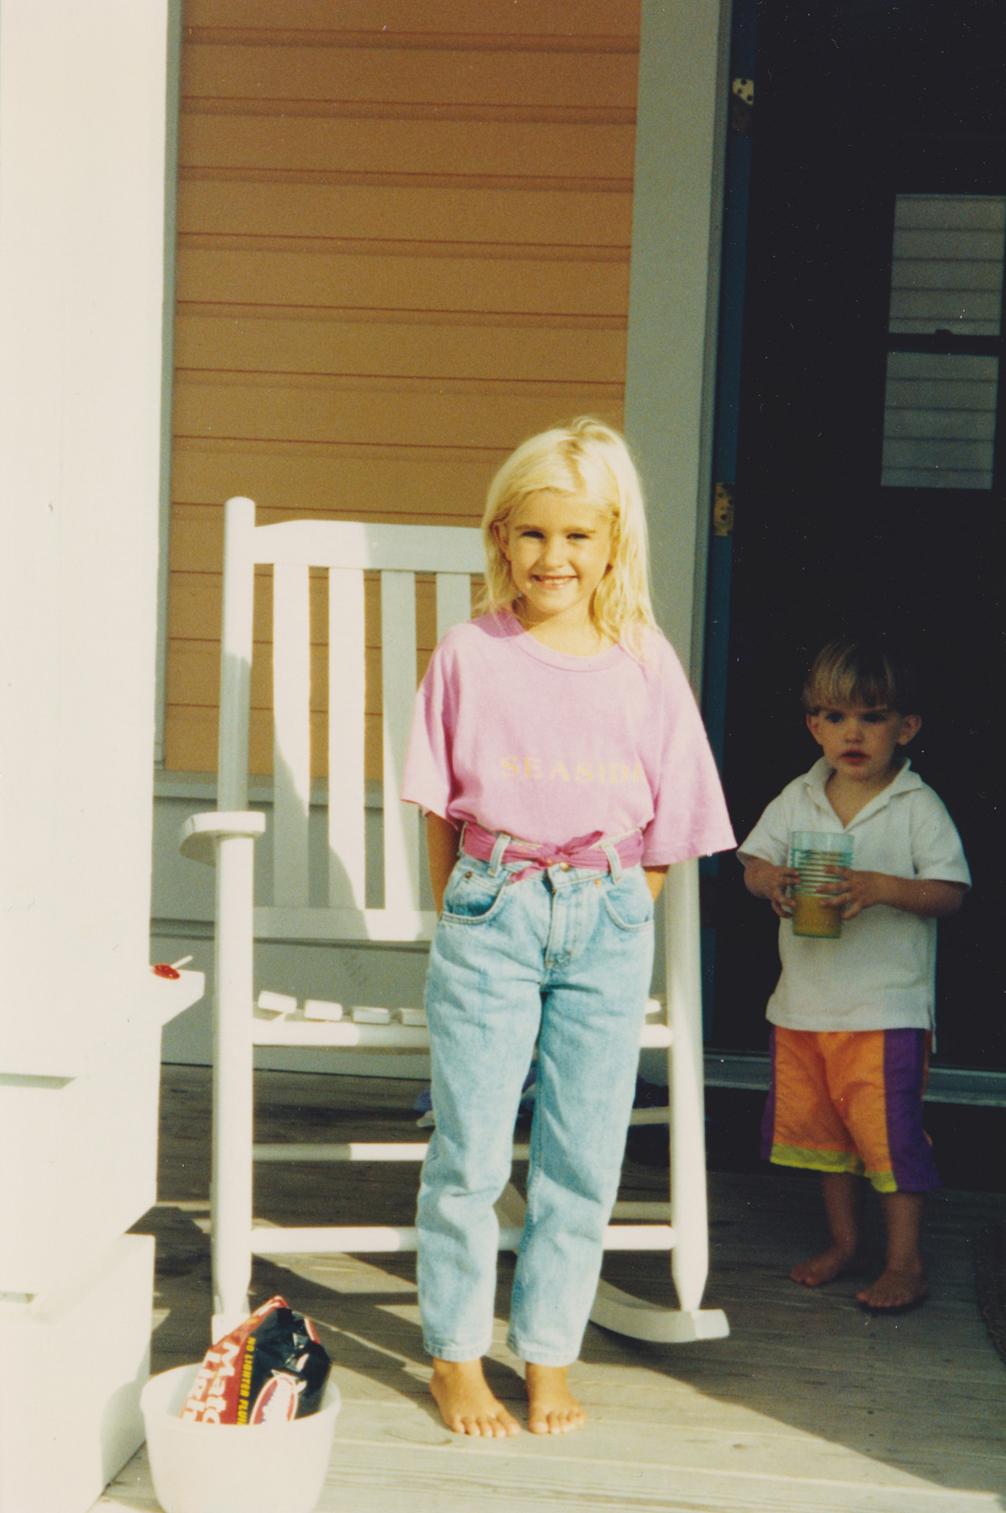 I really wish I still had this outfit.